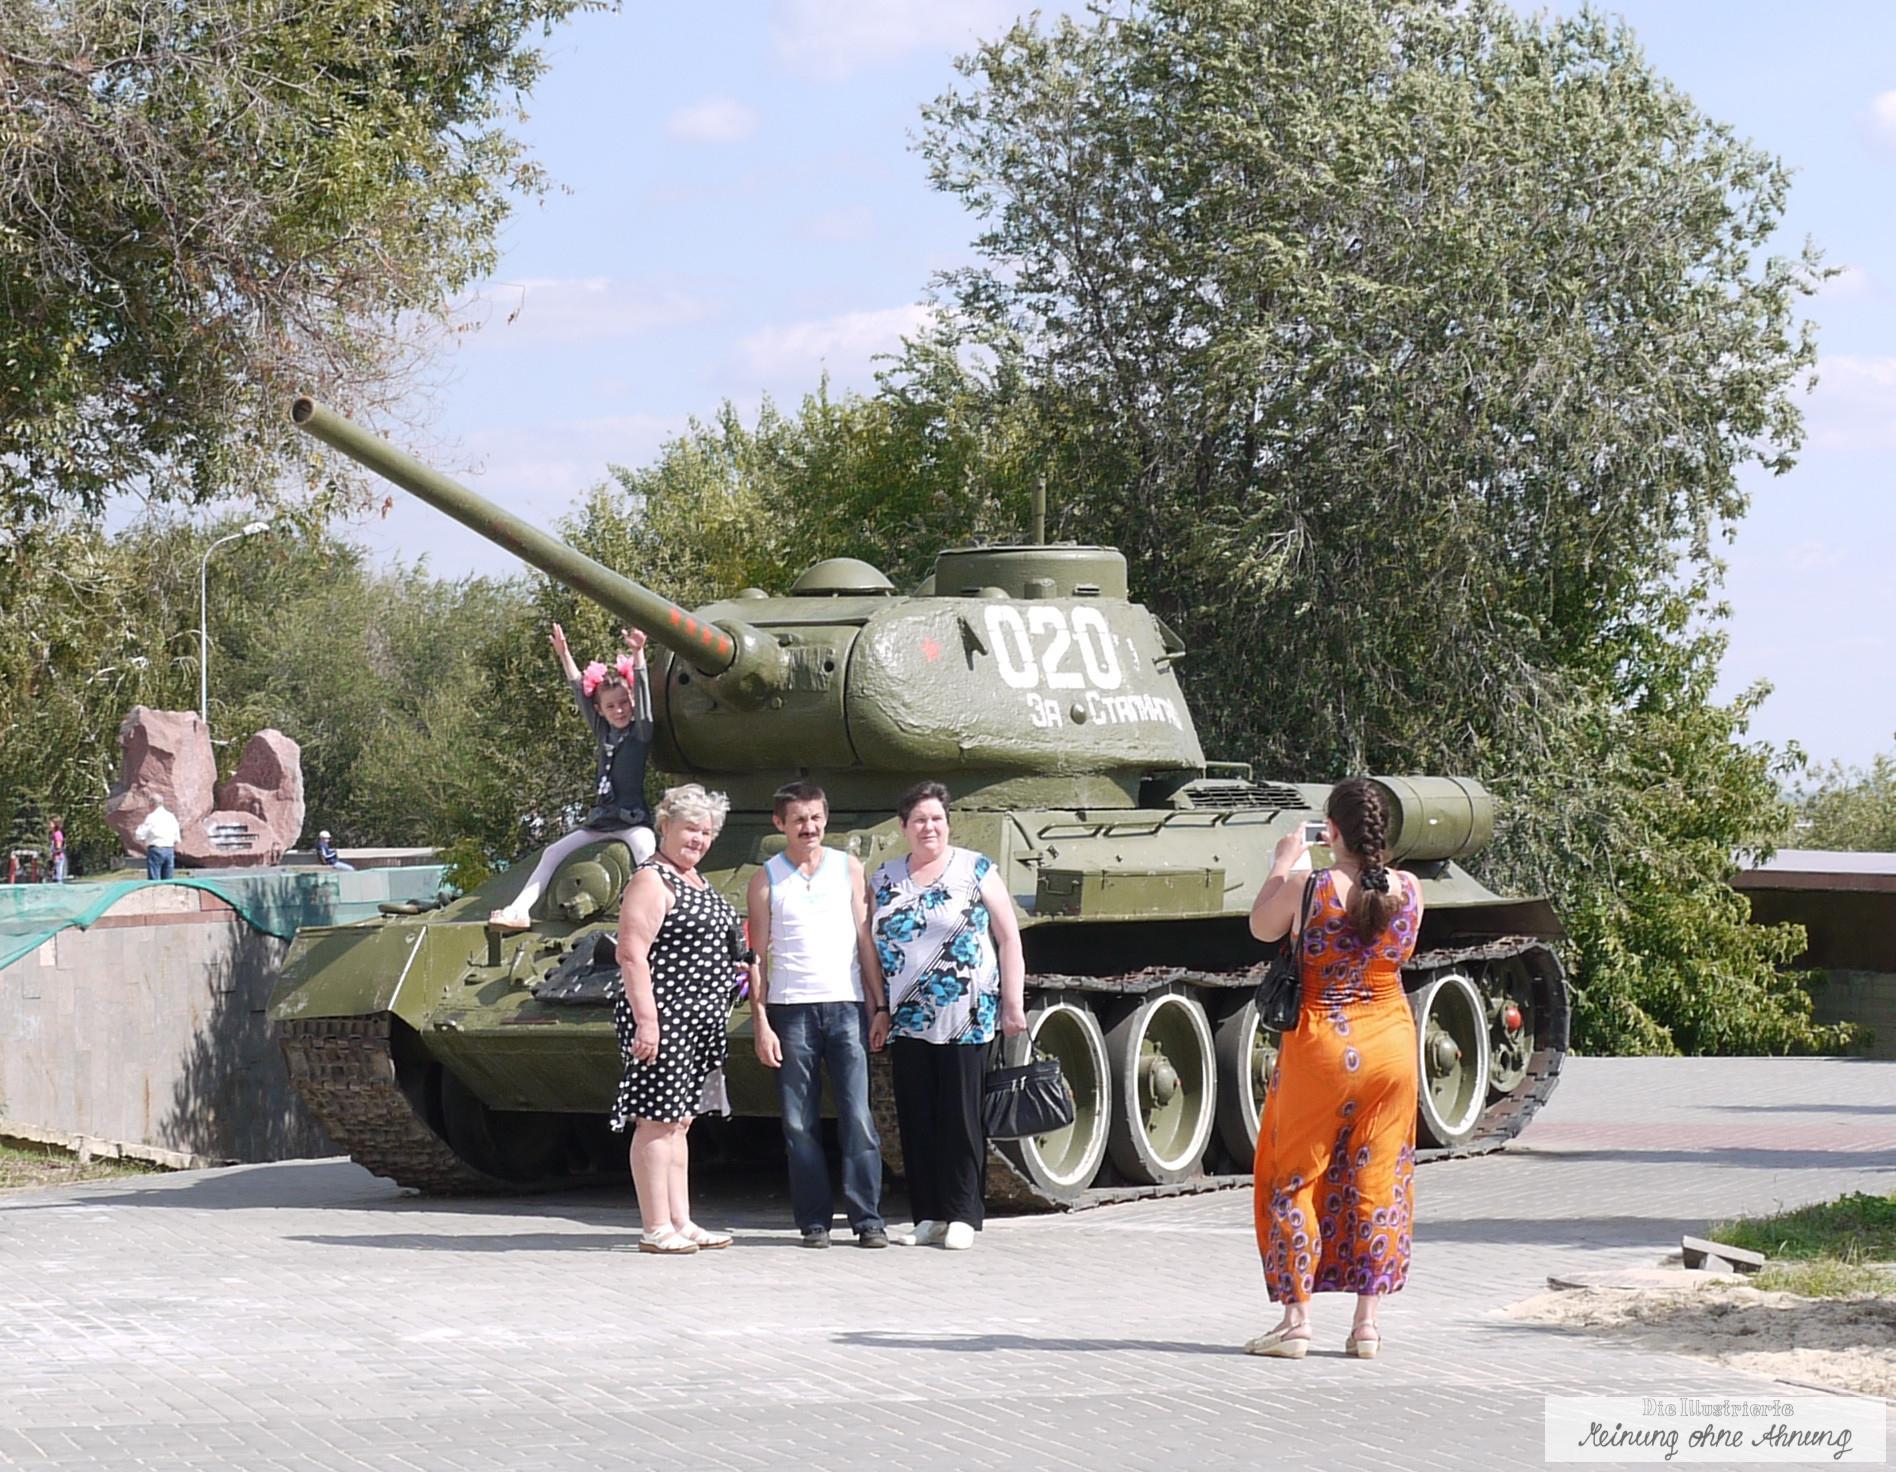 Stalingrad-World-Smile-Day-2017-Meinung-ohne-Ahnung